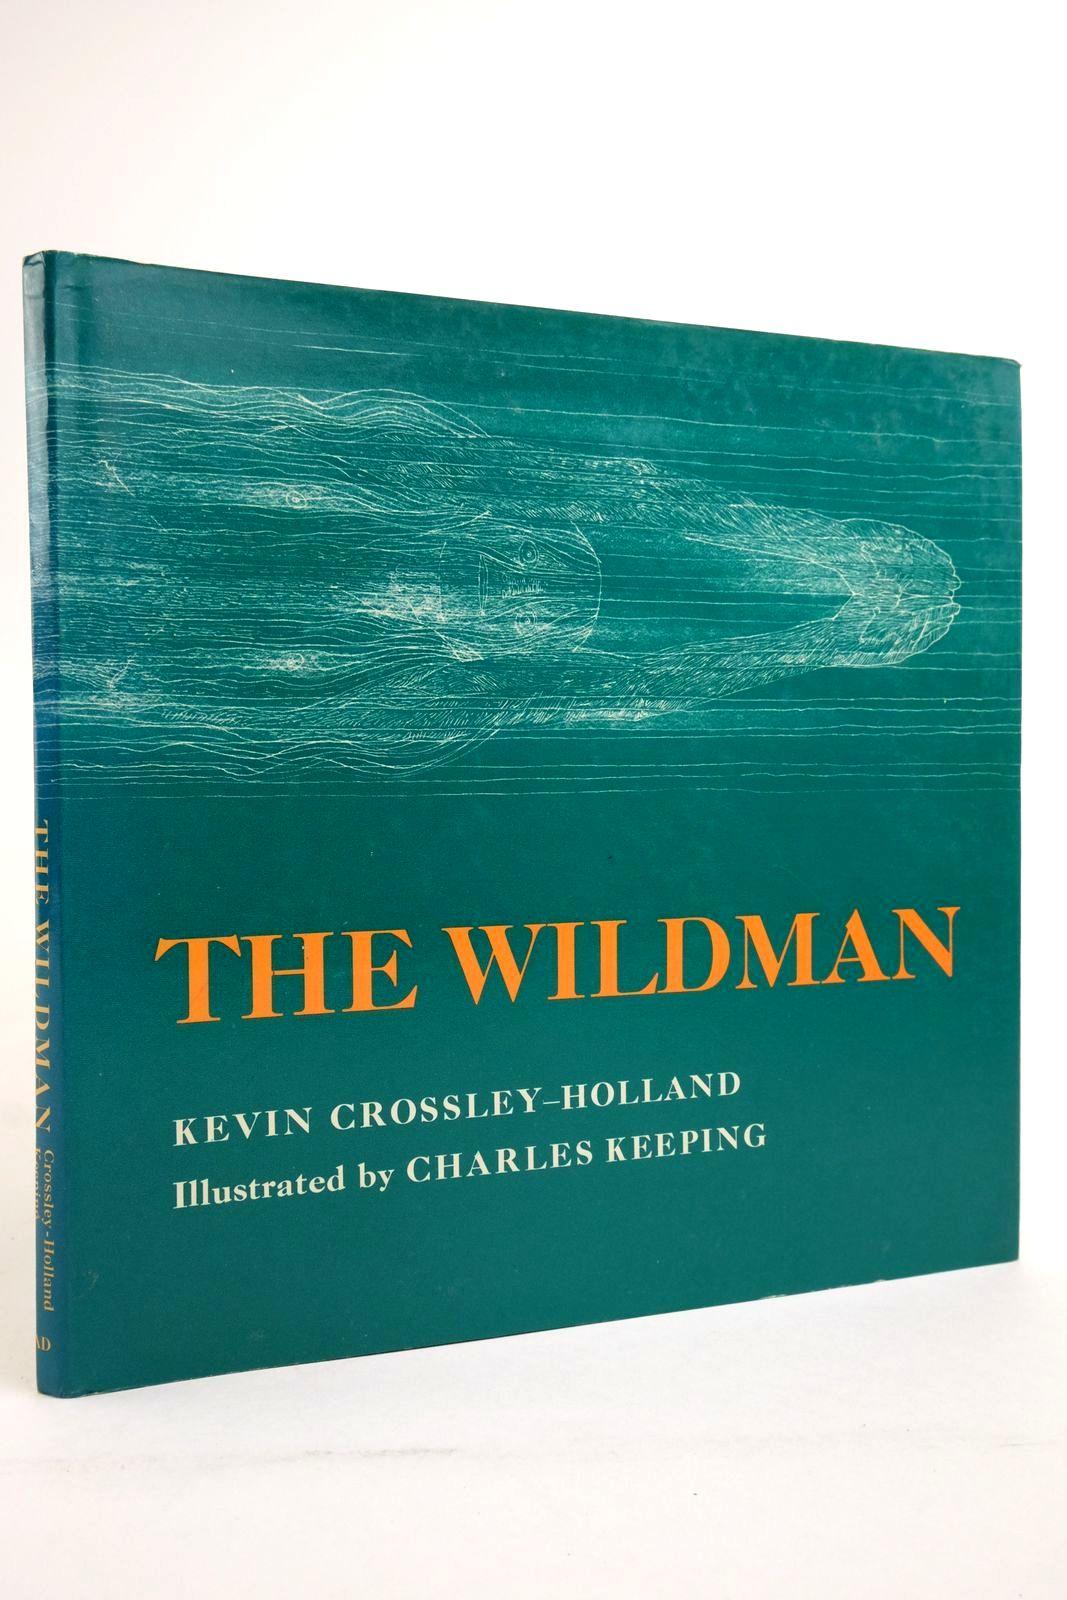 Photo of THE WILDMAN- Stock Number: 2135577